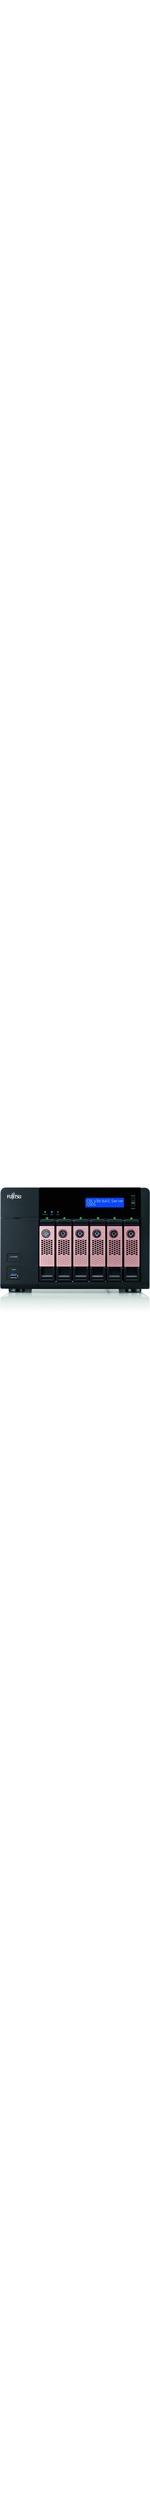 Fujitsu CELVIN Q905 6 x Total Bays NAS Server - Desktop - Intel Celeron J1900 Quad-core 4 Core 2.42 GHz - 24 TB HDD - Serial ATA/600 - RAID Supported 0, 1, 5, 6, 1